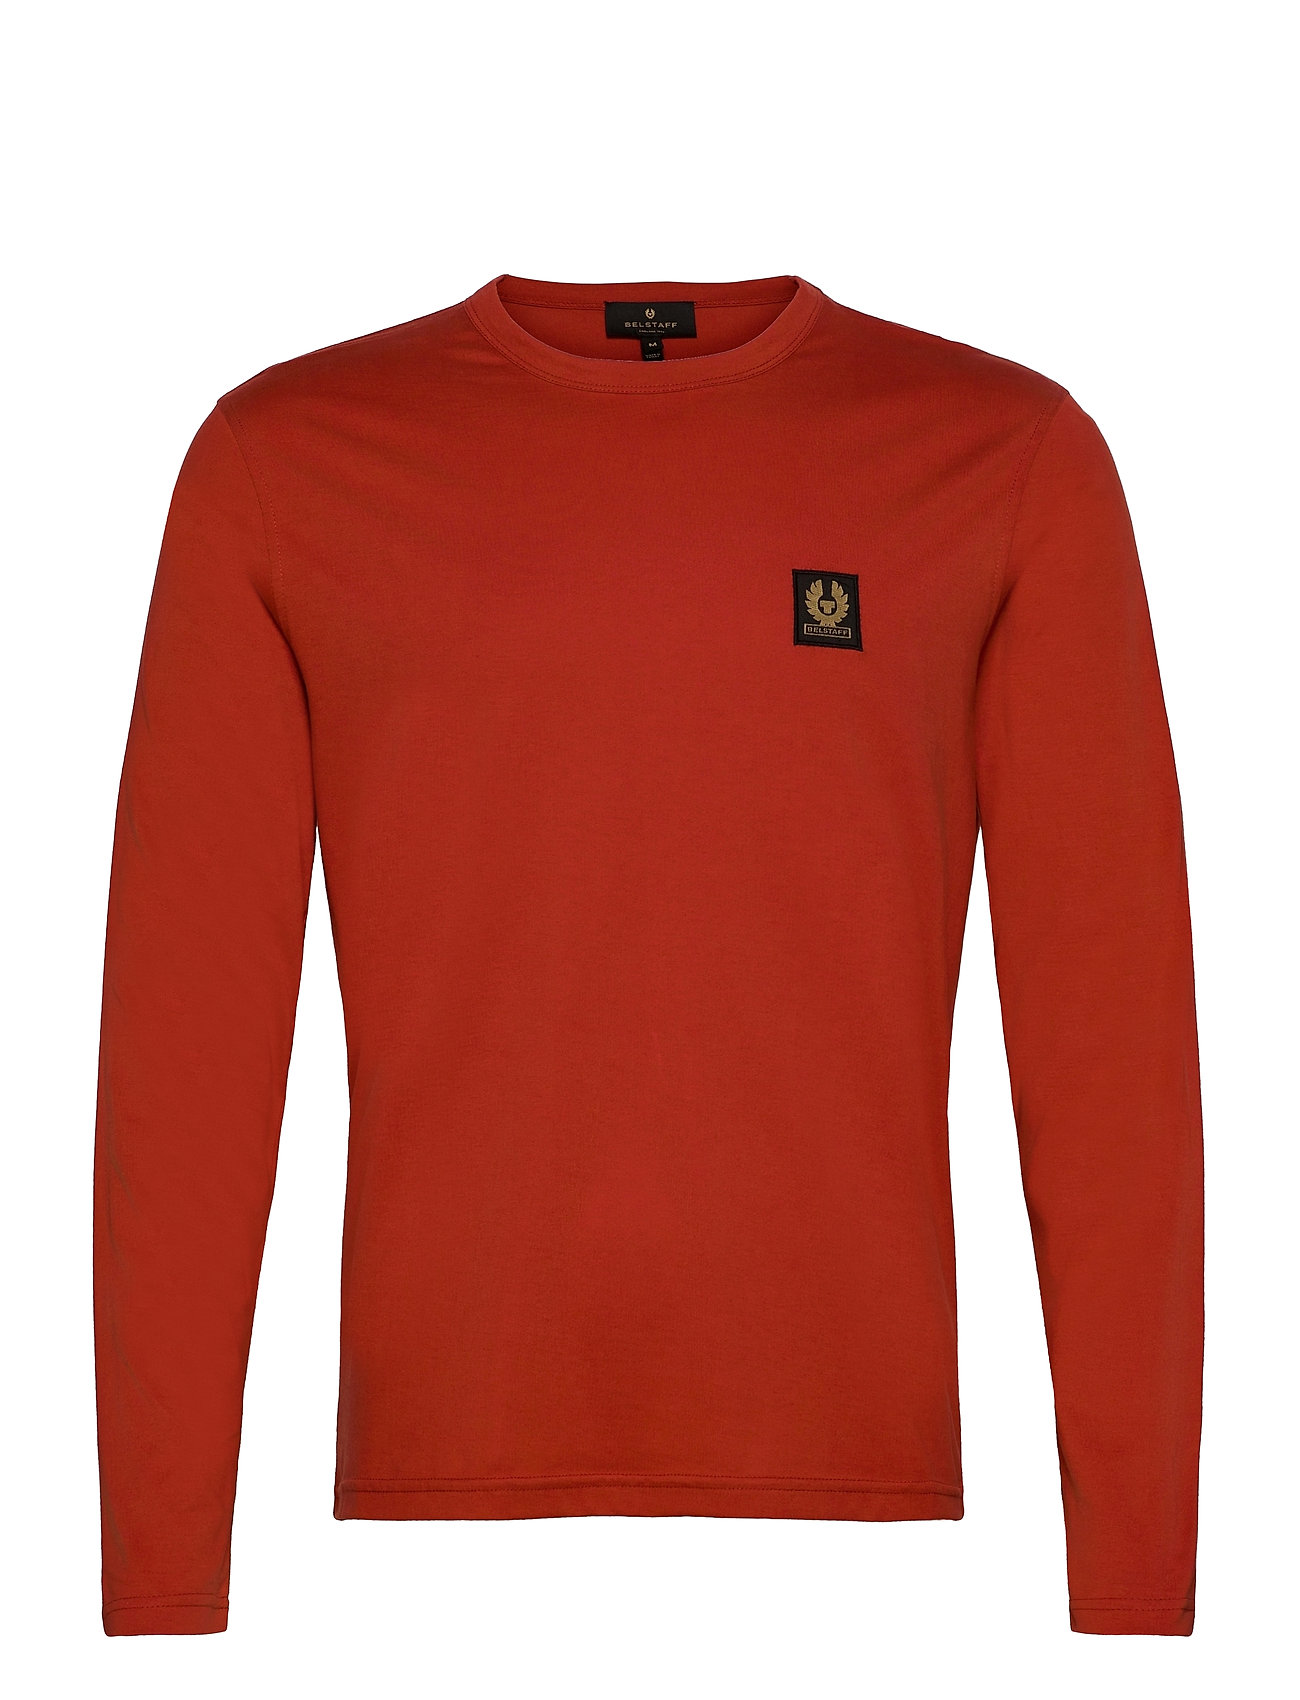 Belstaff L/S T-Shirt T-Langærmet Skjorte Rød Belstaff